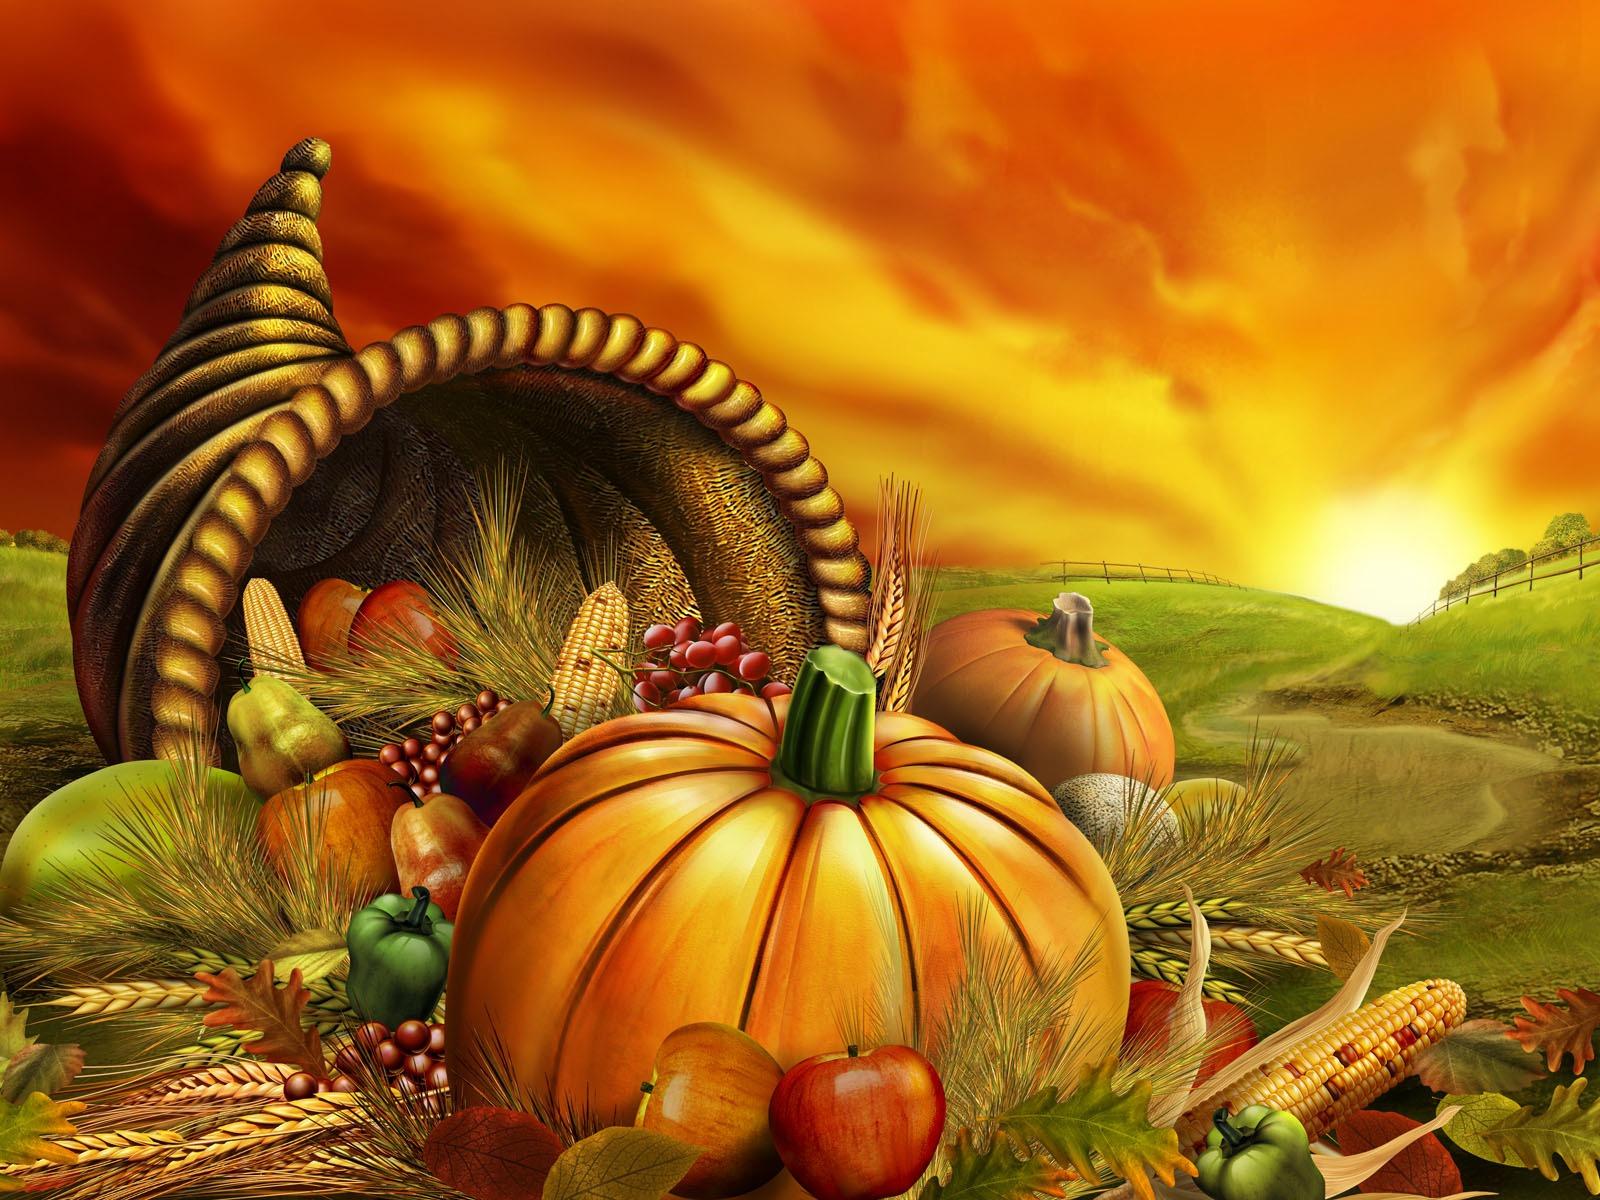 Thanksgiving Desktop Wallpaper and Screensavers 7 1600x1200